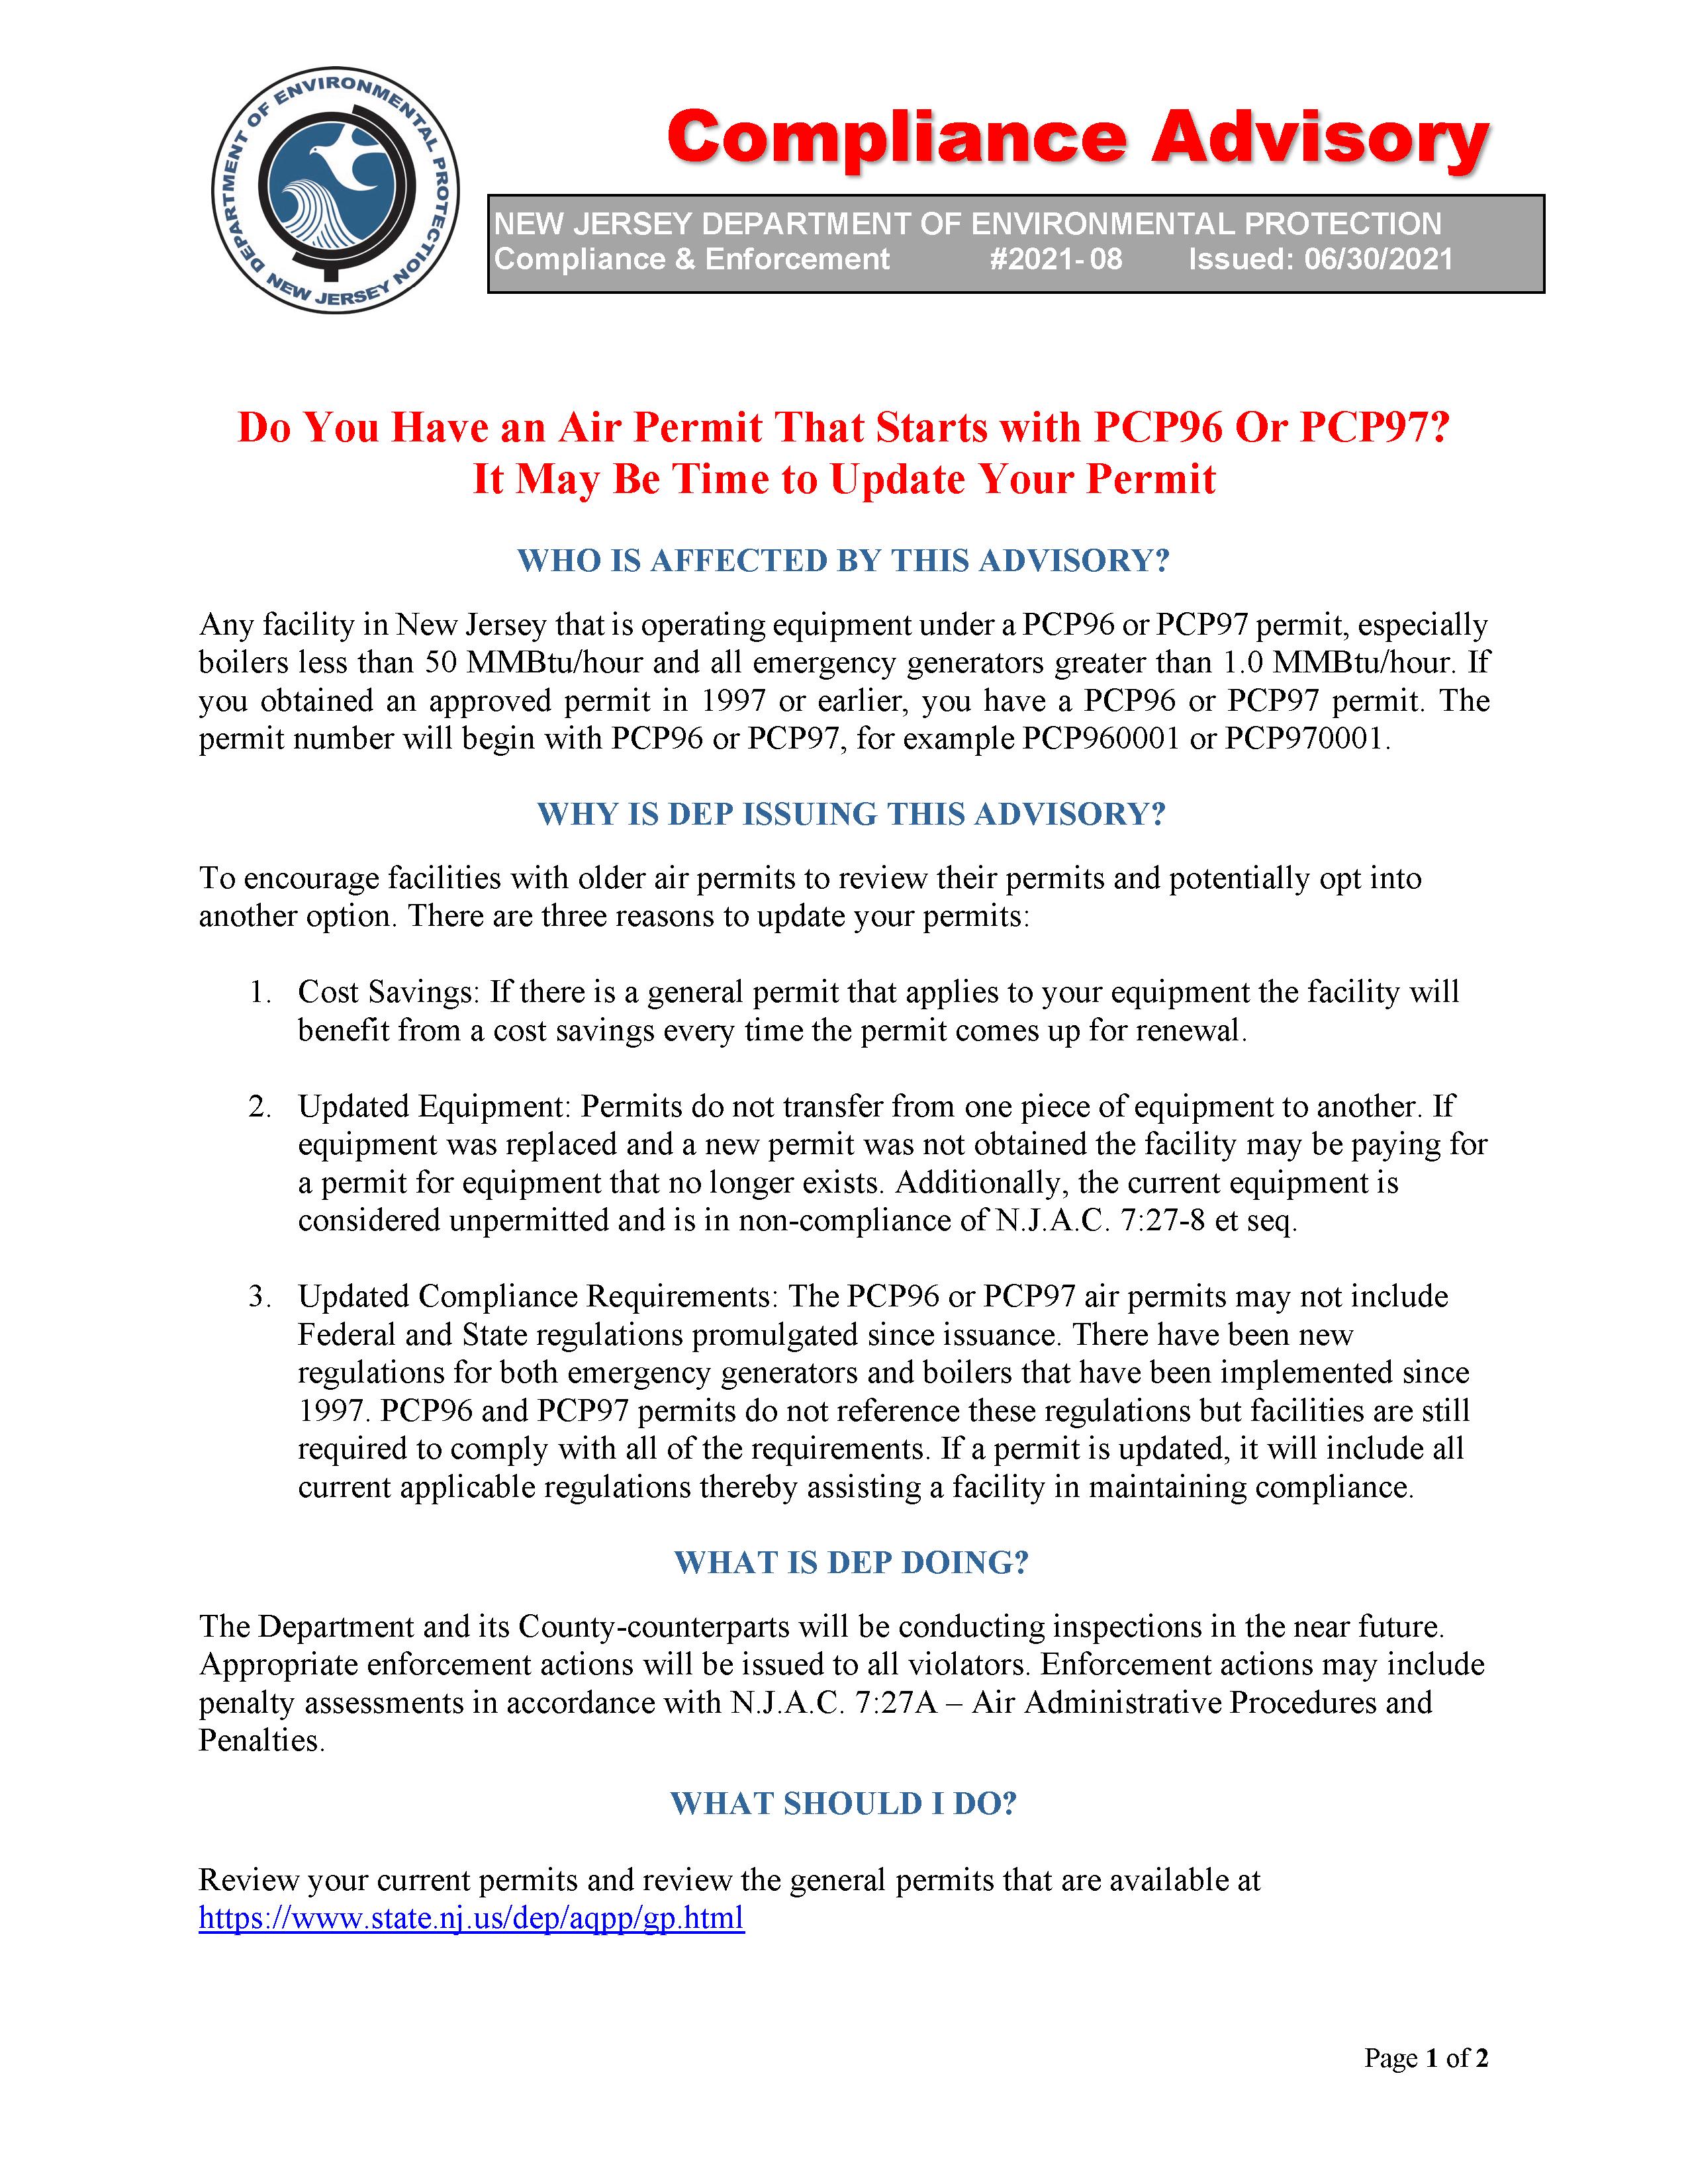 NJDEP PCP96 Air Permit Compliance Advisory